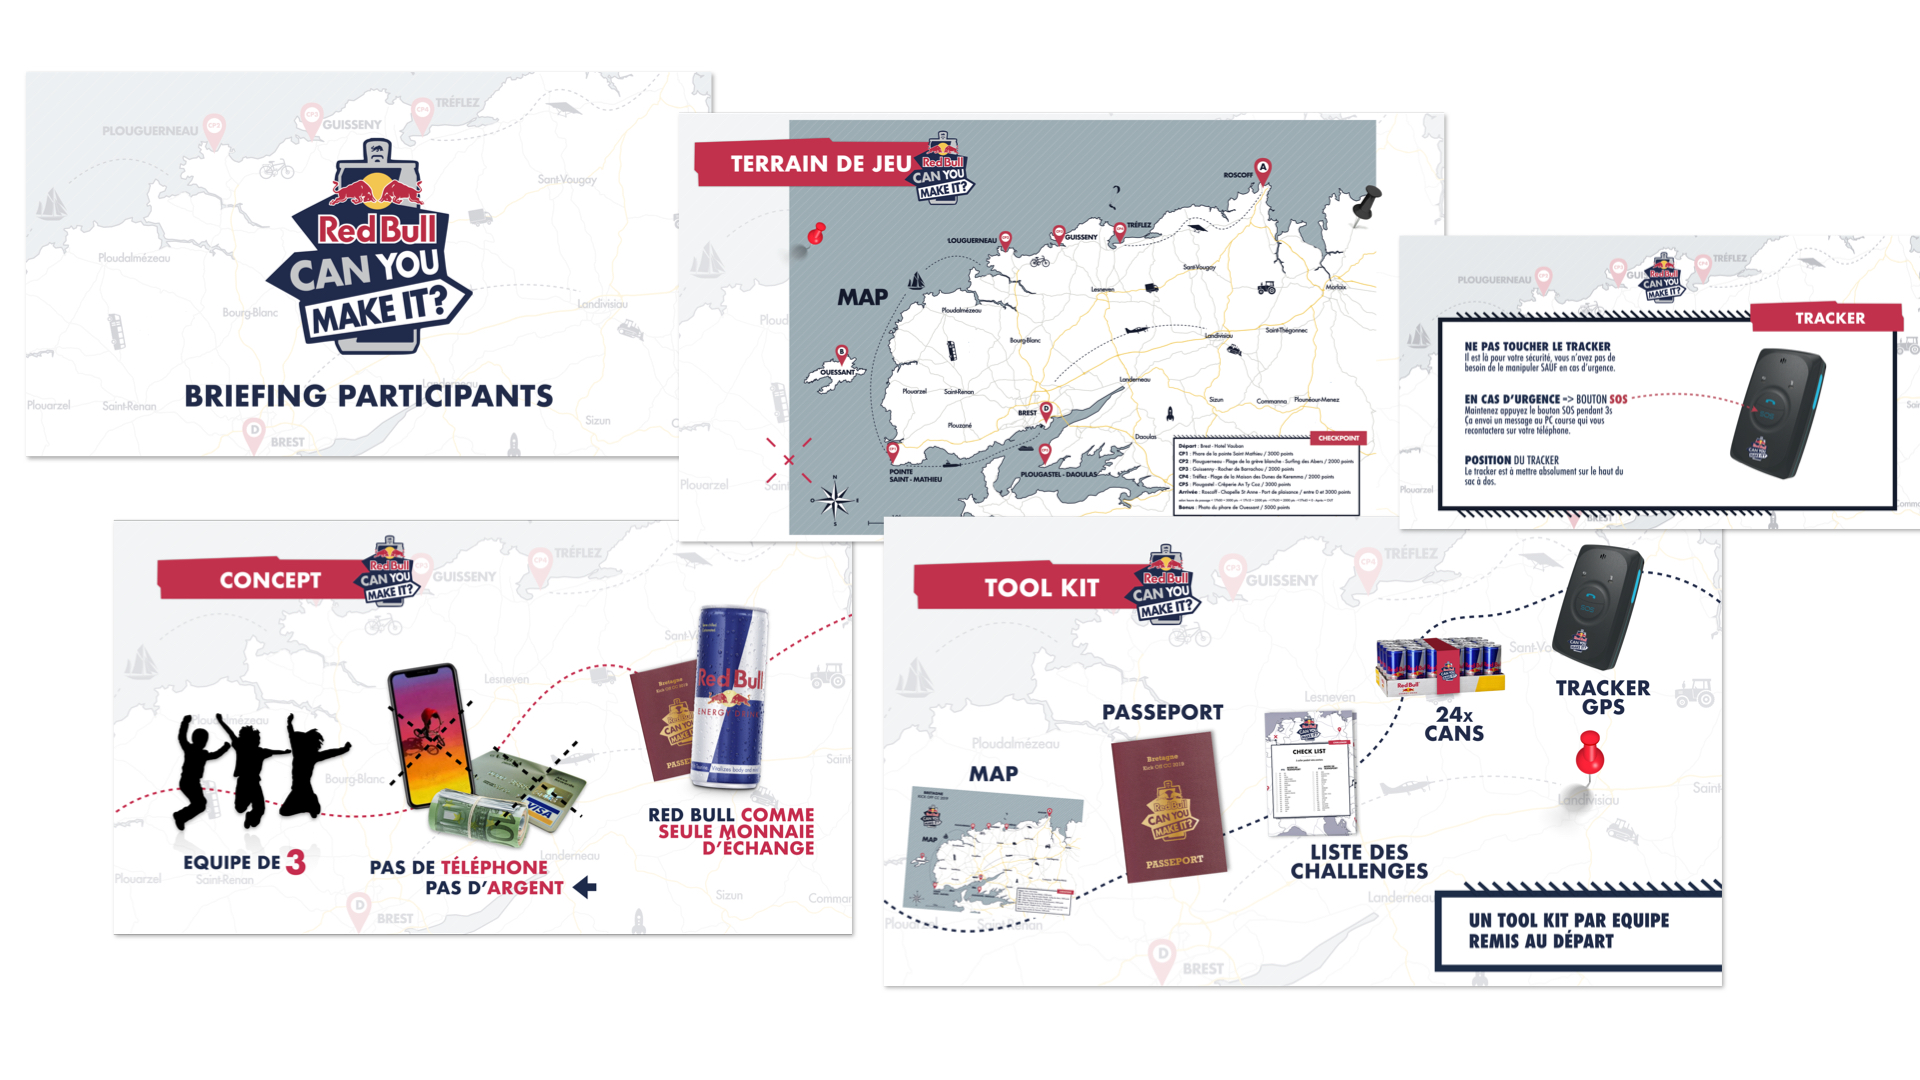 Red Bull Can You Make It - Bretagne - KOCC19 - Wagon Blanc